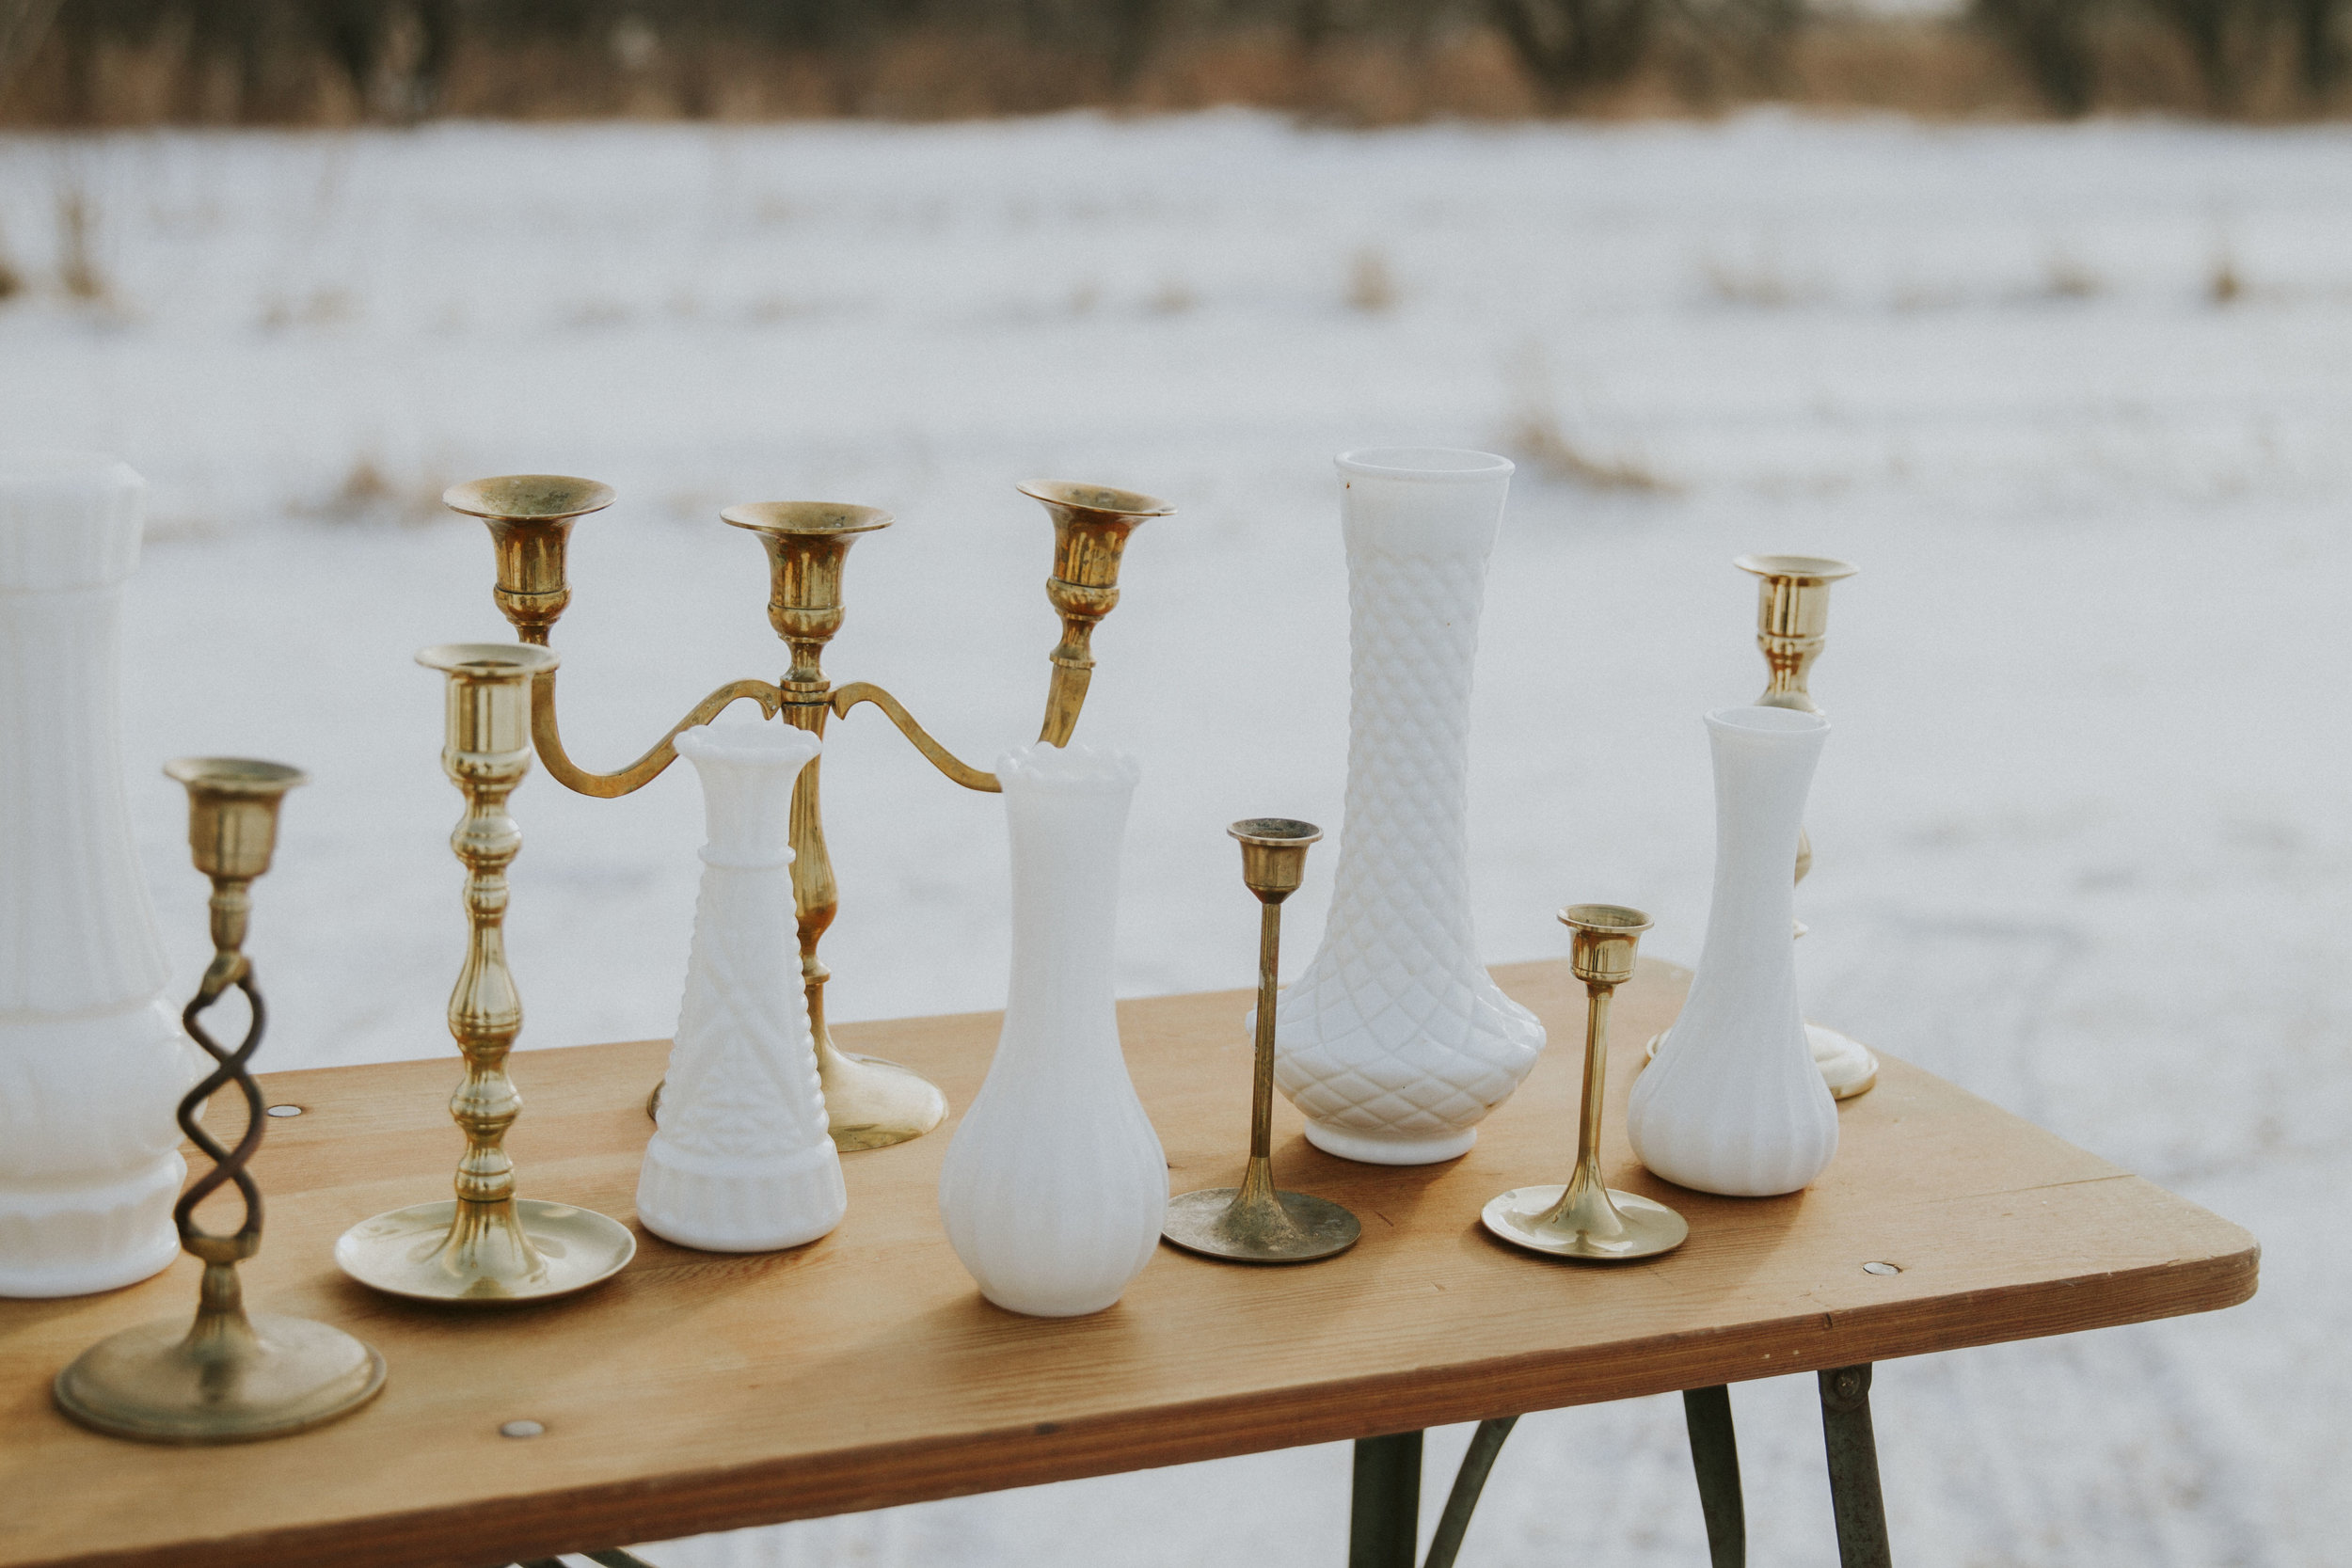 Gold Candlesticks & Milk Glass Vases